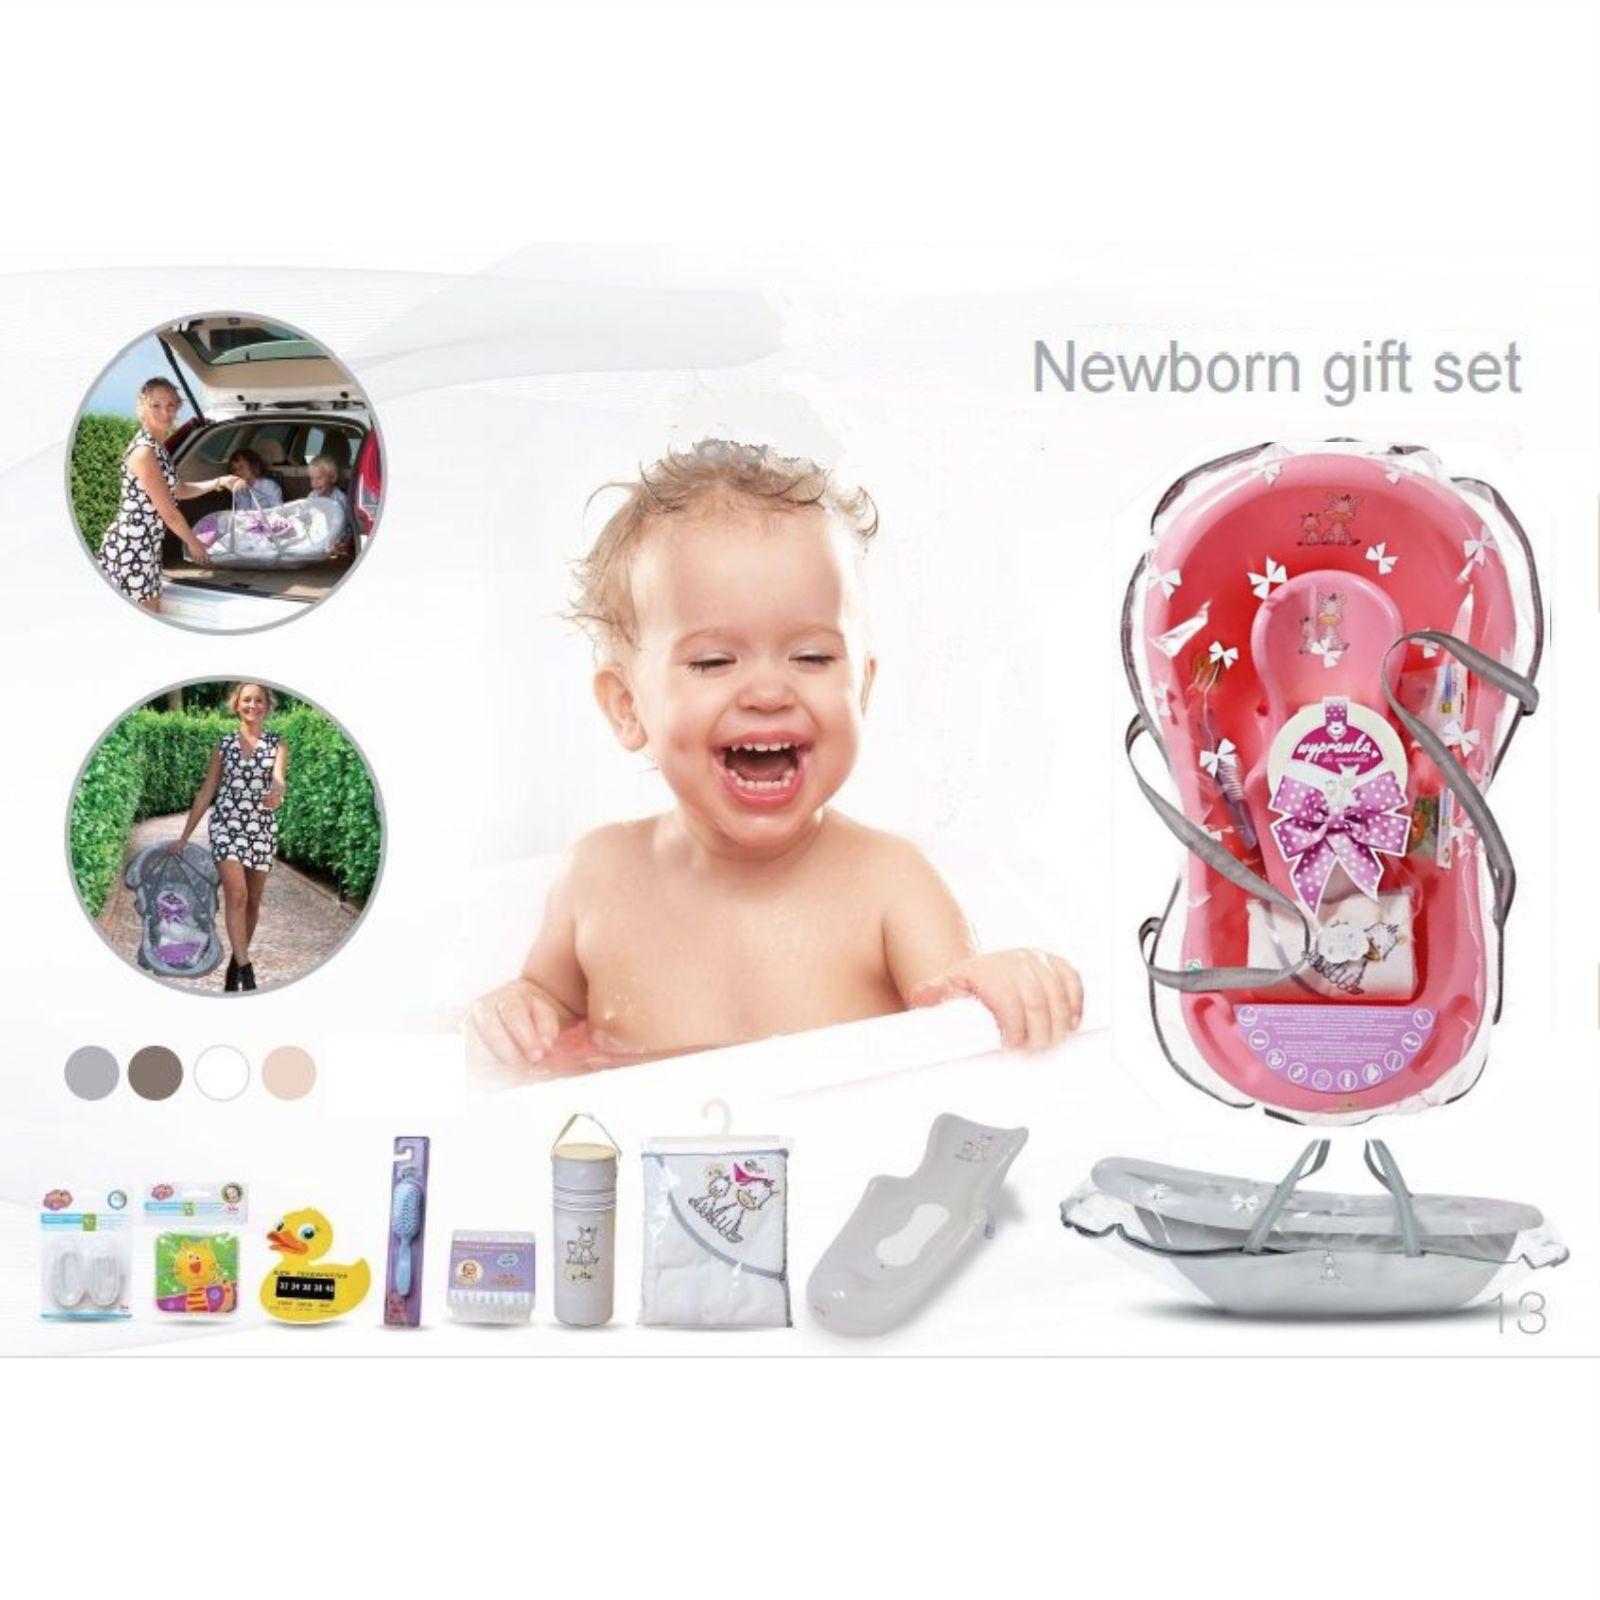 Maltex Baby Bath Gift Set With Accessories - Zebra Pink | Buy at ...